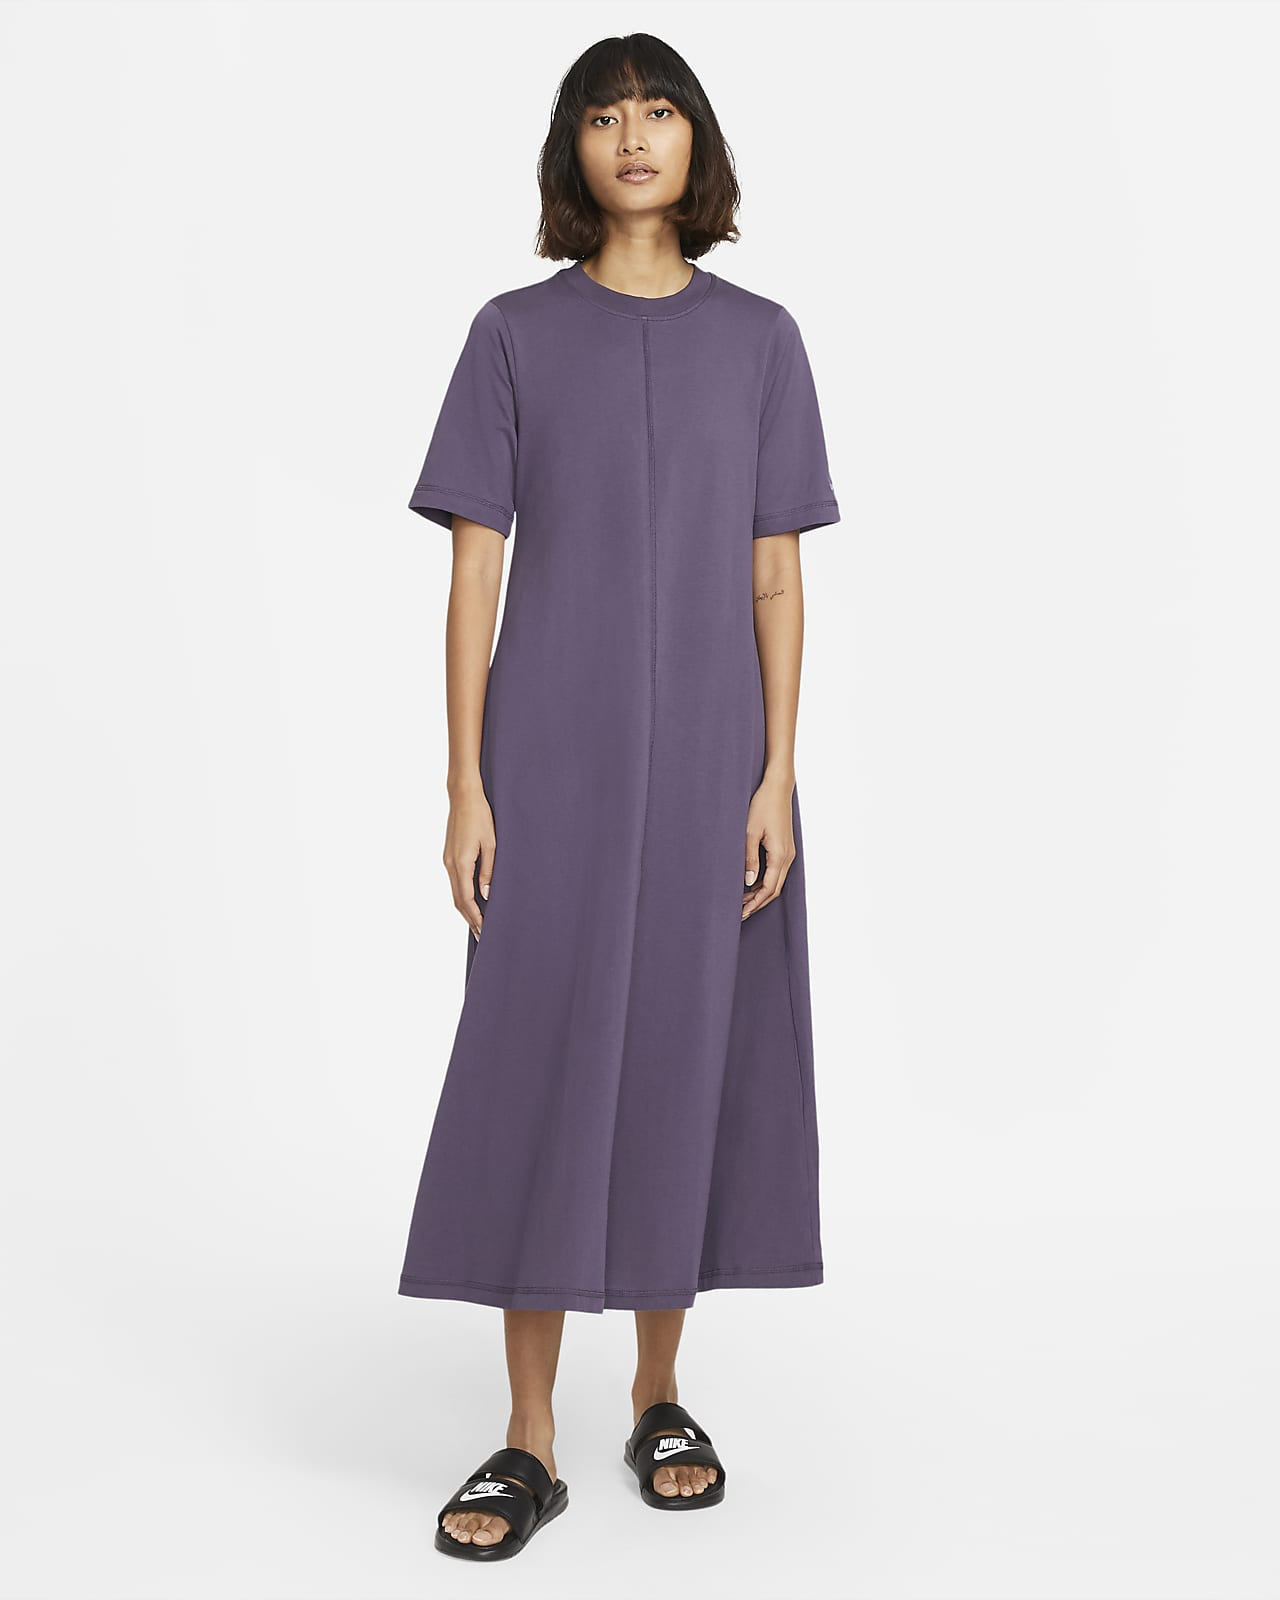 Vestido de manga corta para mujer Nike Sportswear